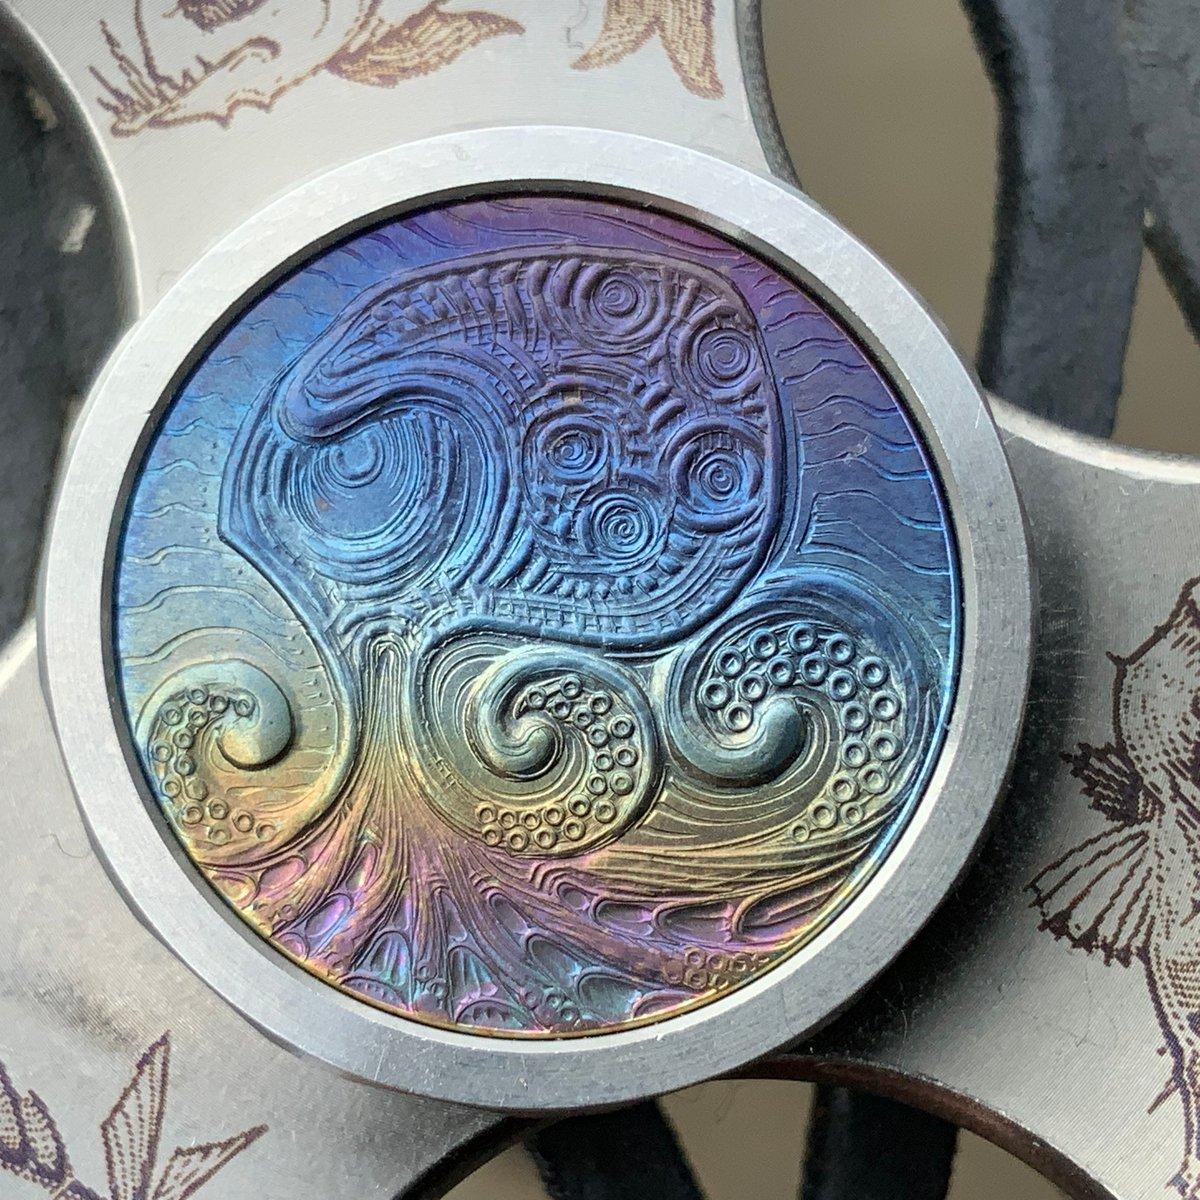 Titanium AngrFish2 buttons